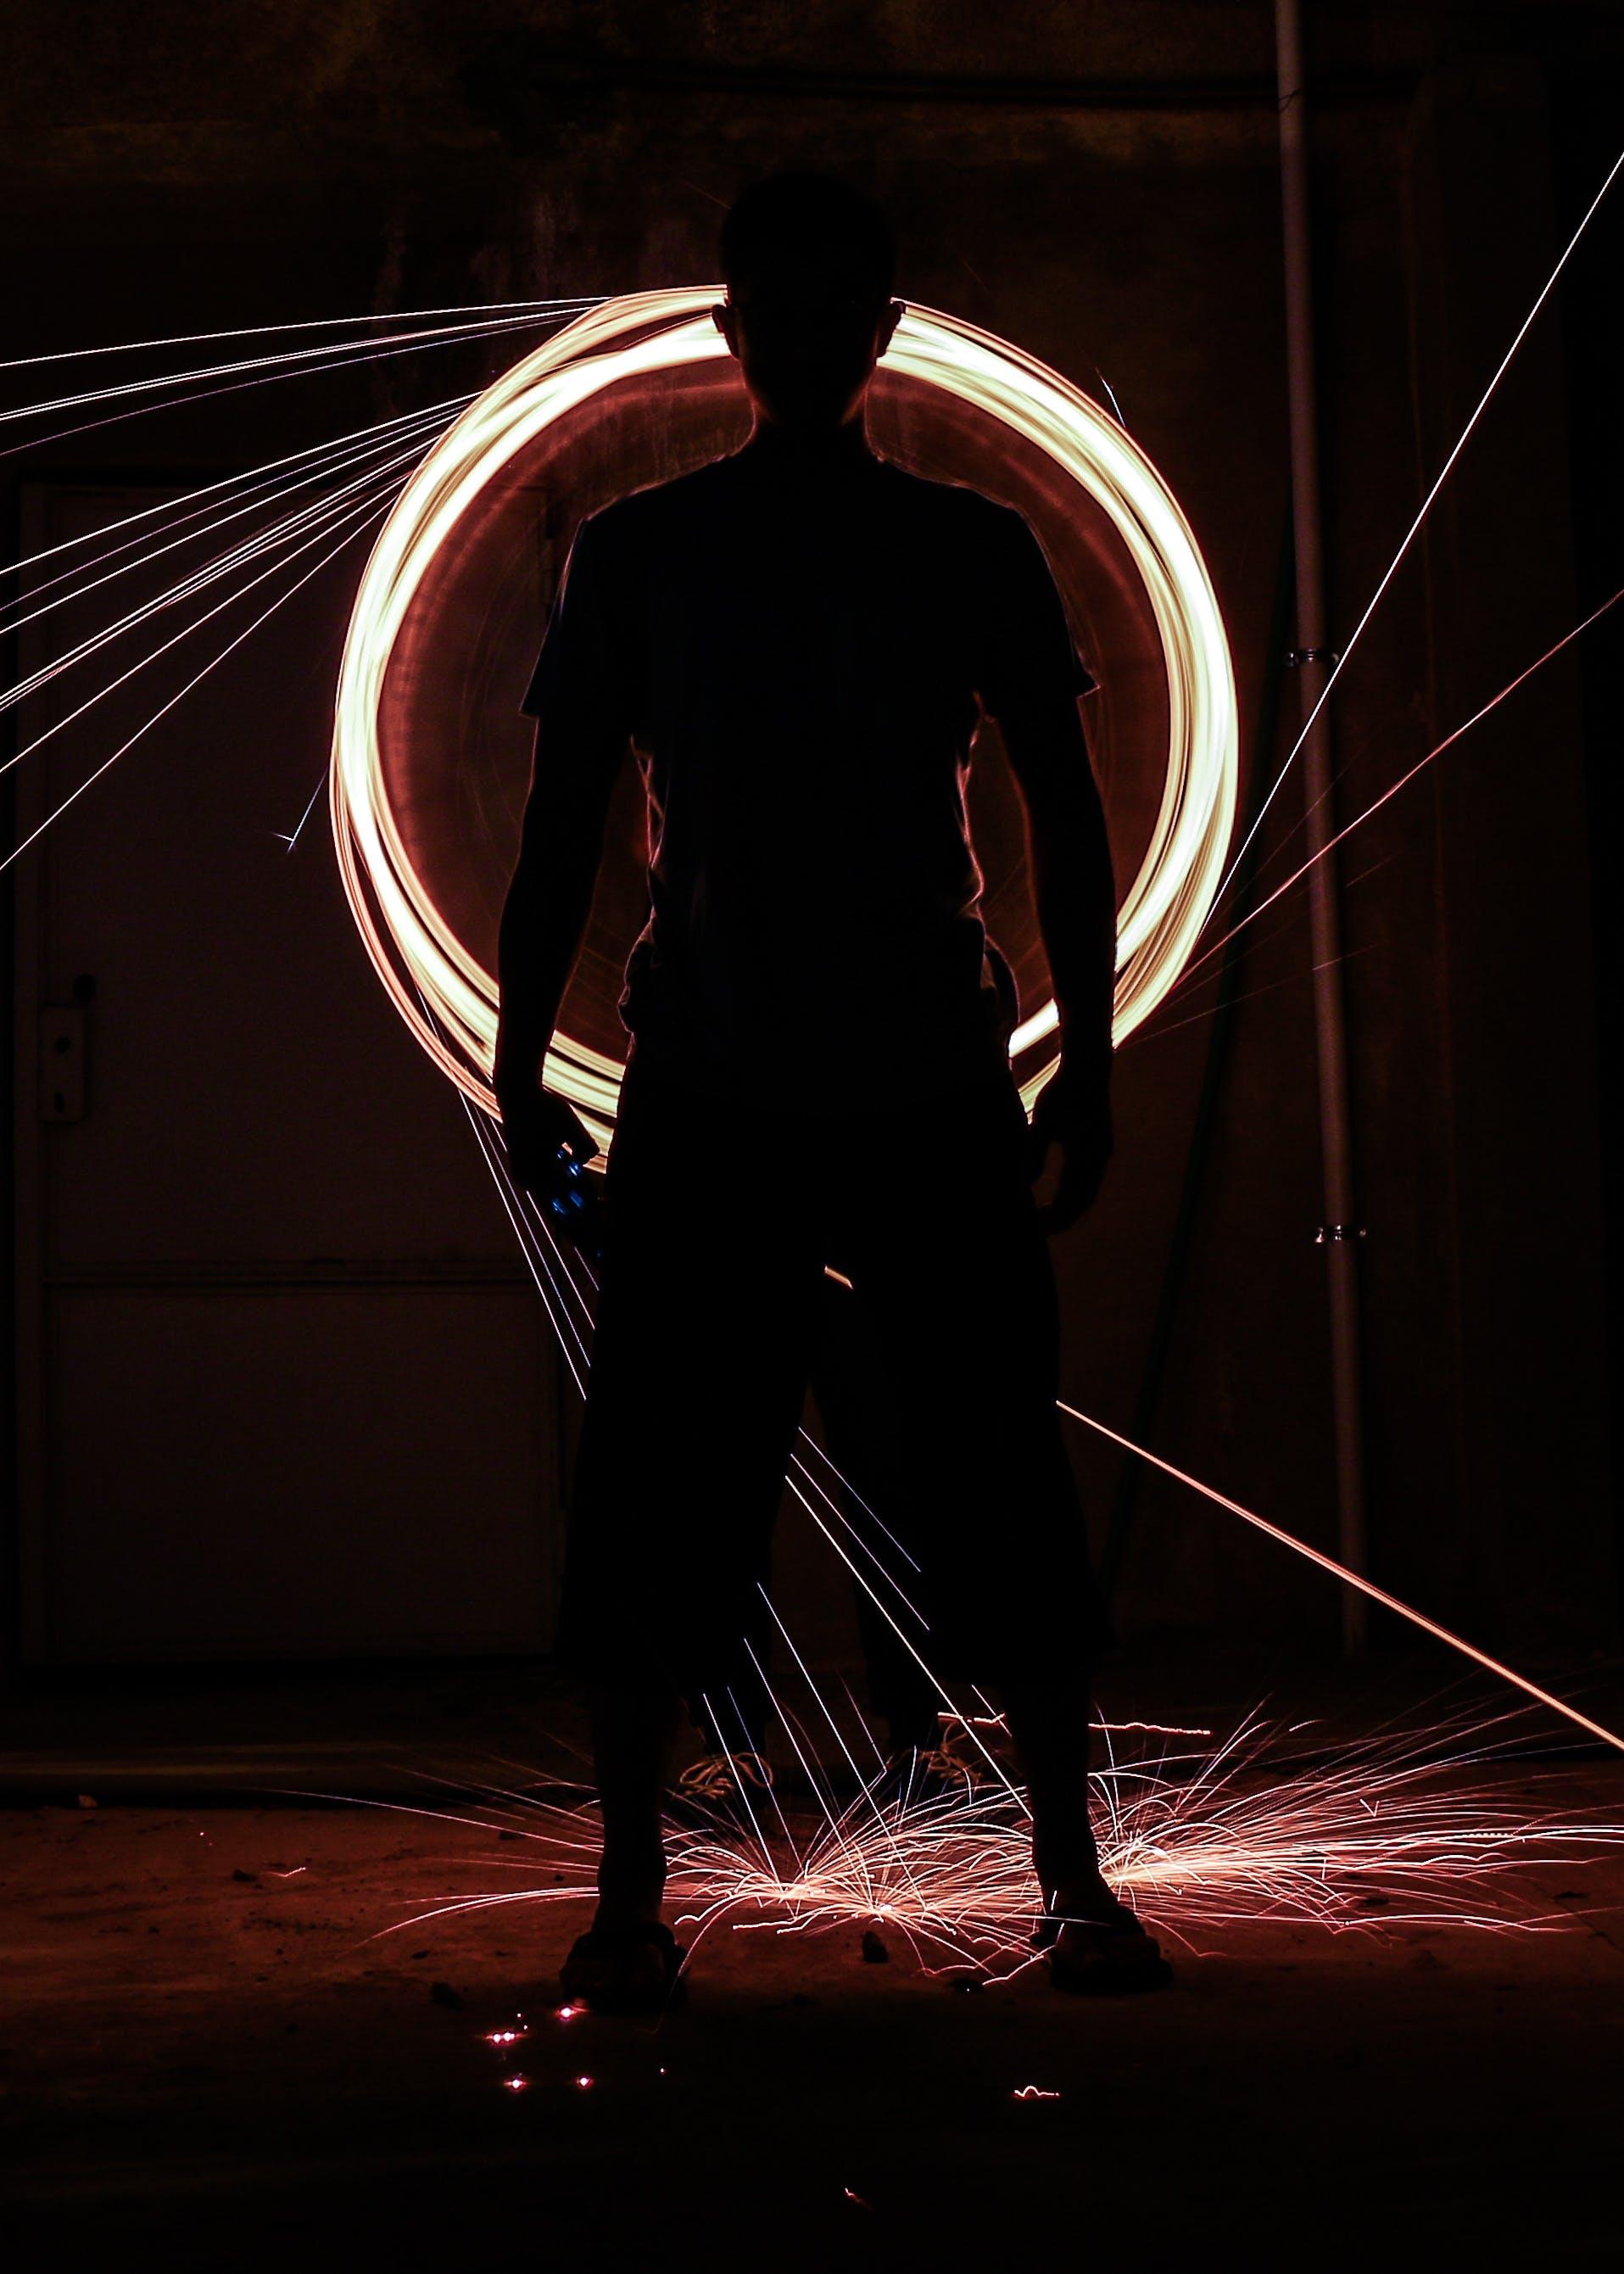 Time-lapse Photo of Poi Dancer